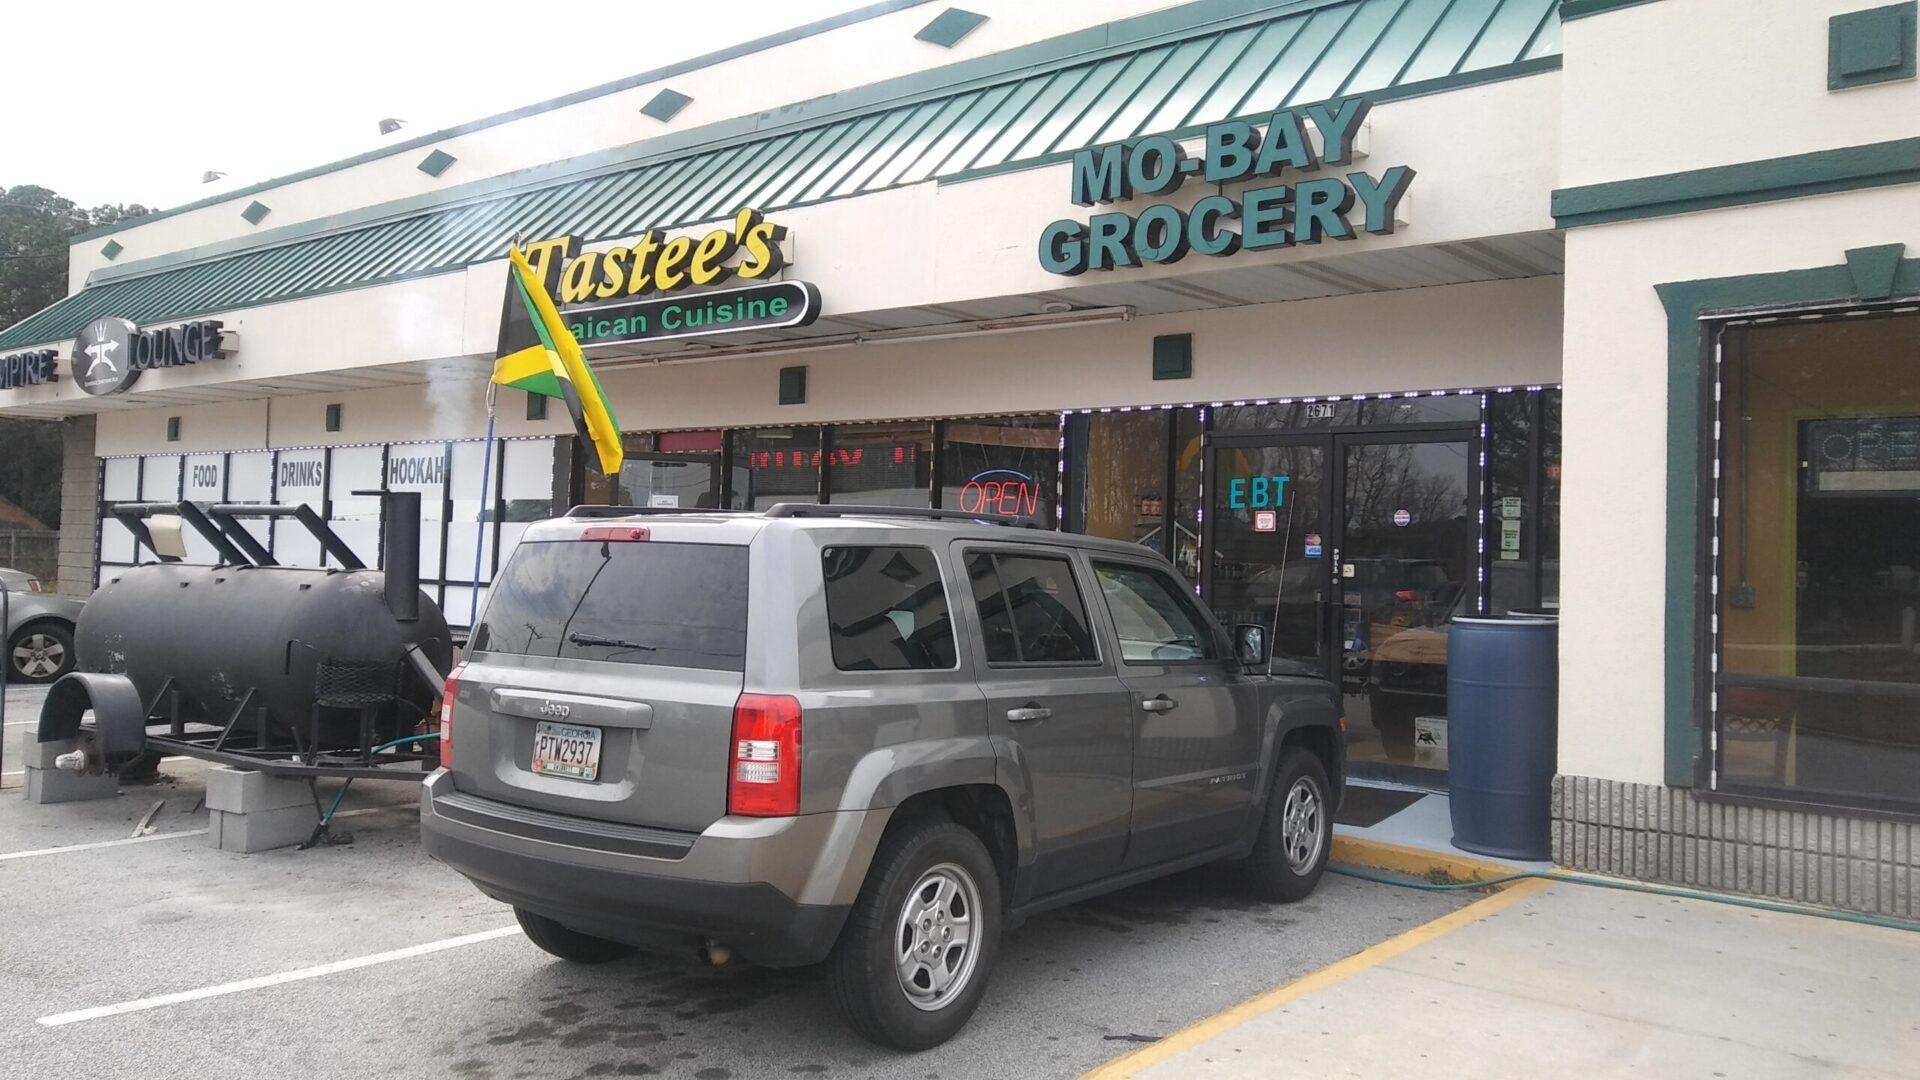 Tastee's Jamaican Cuisine